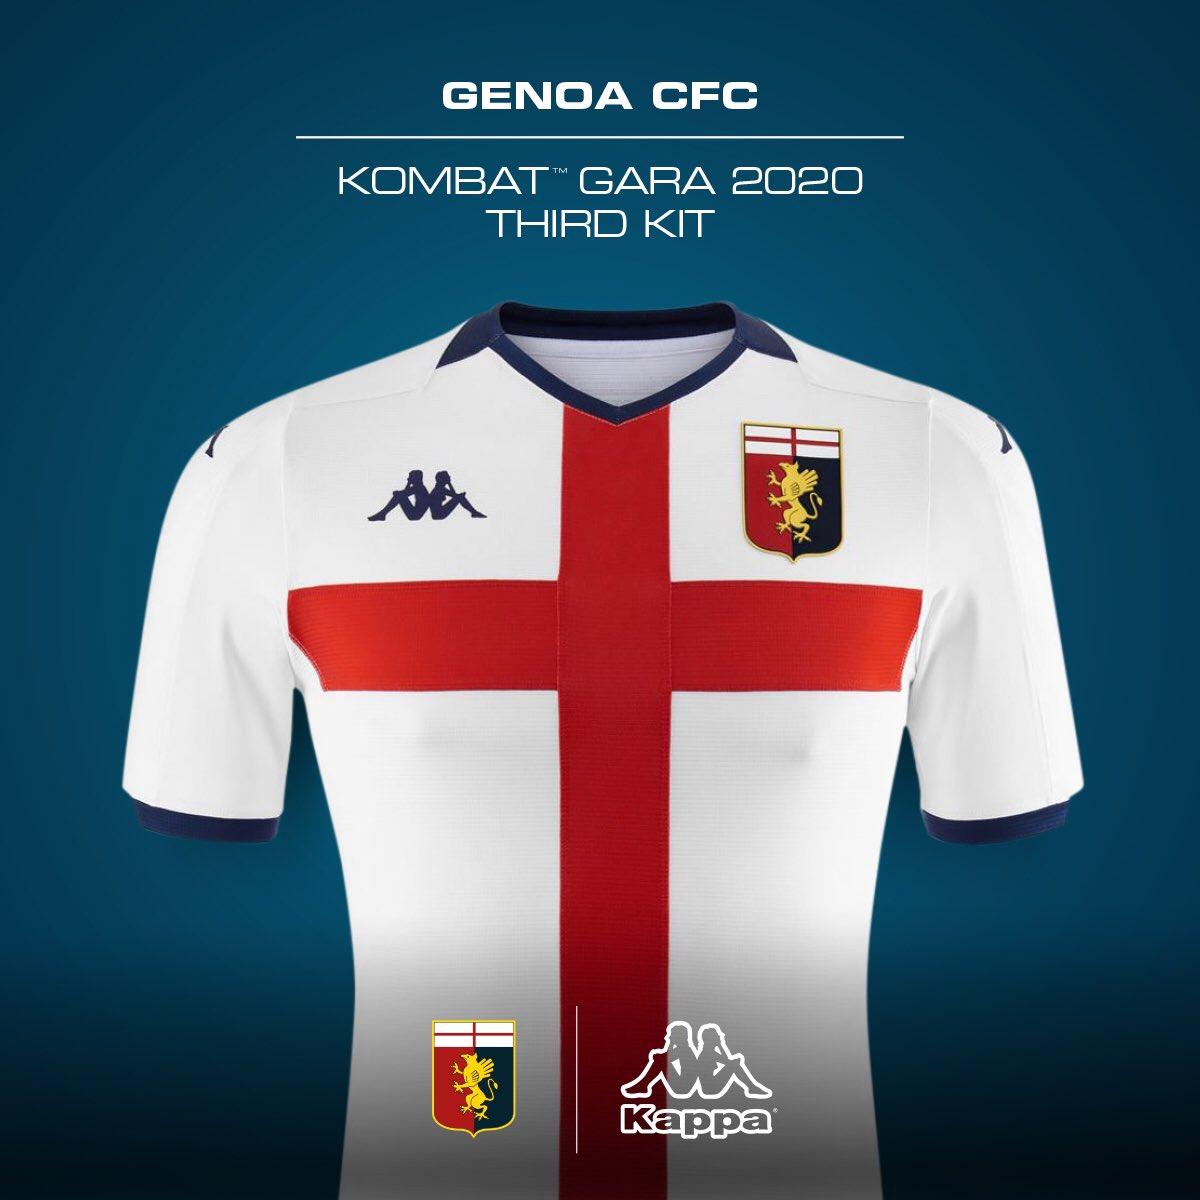 Tercera camiseta Kappa del Genoa CFC 2019/20 | Imagen Instagram Oficial